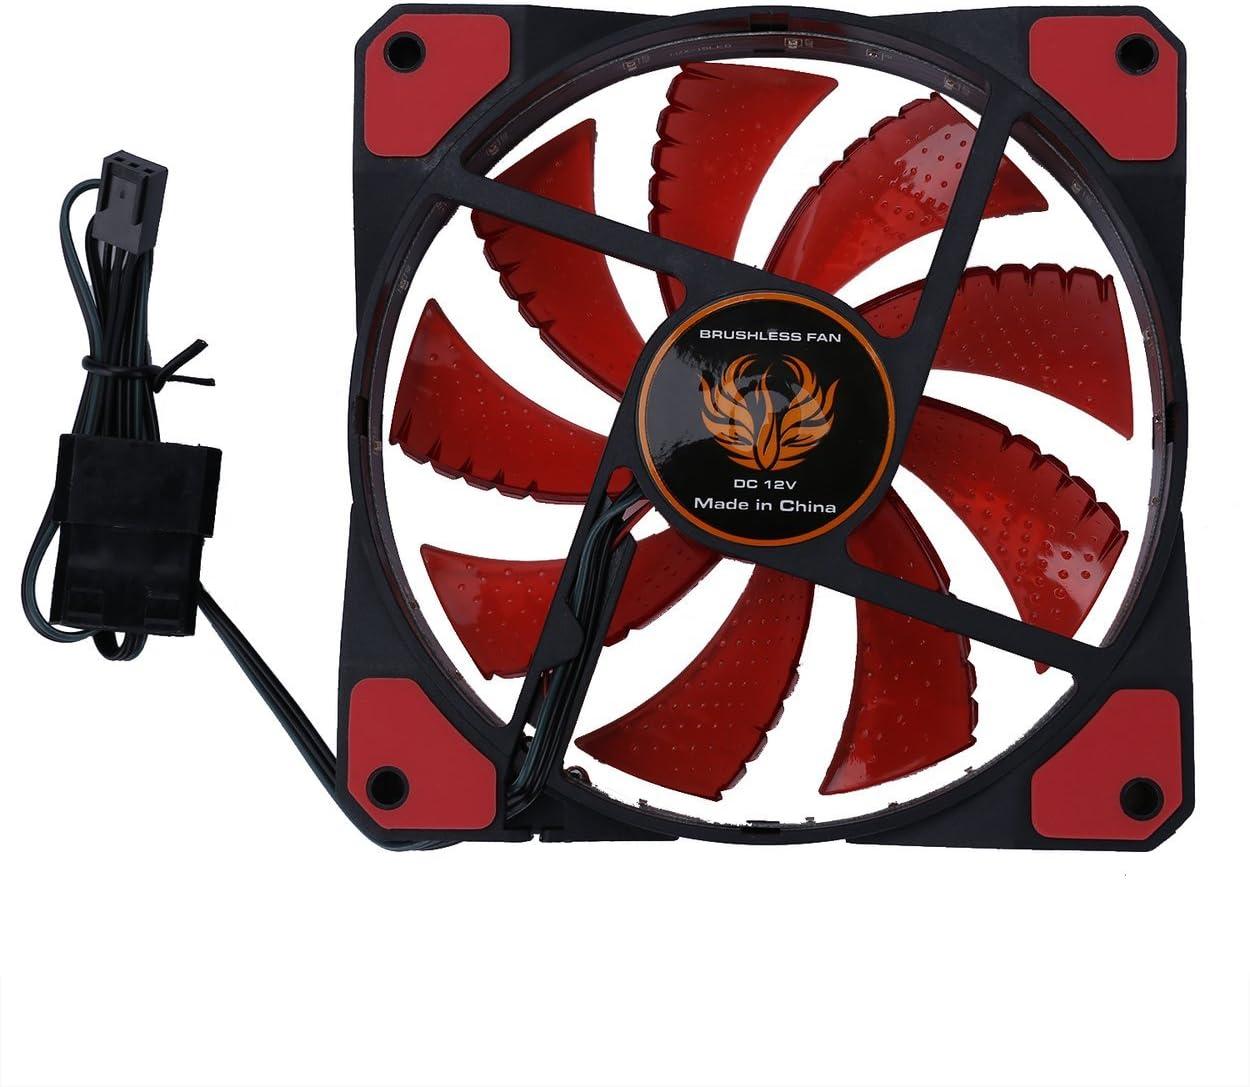 Lorenlli Ventilador de Caja de PC de computadora Ultra silenciosa de 120mm LED 15 Leds 12V con Ventilador silencioso Molex Conector Fácil Instalado Ventilador